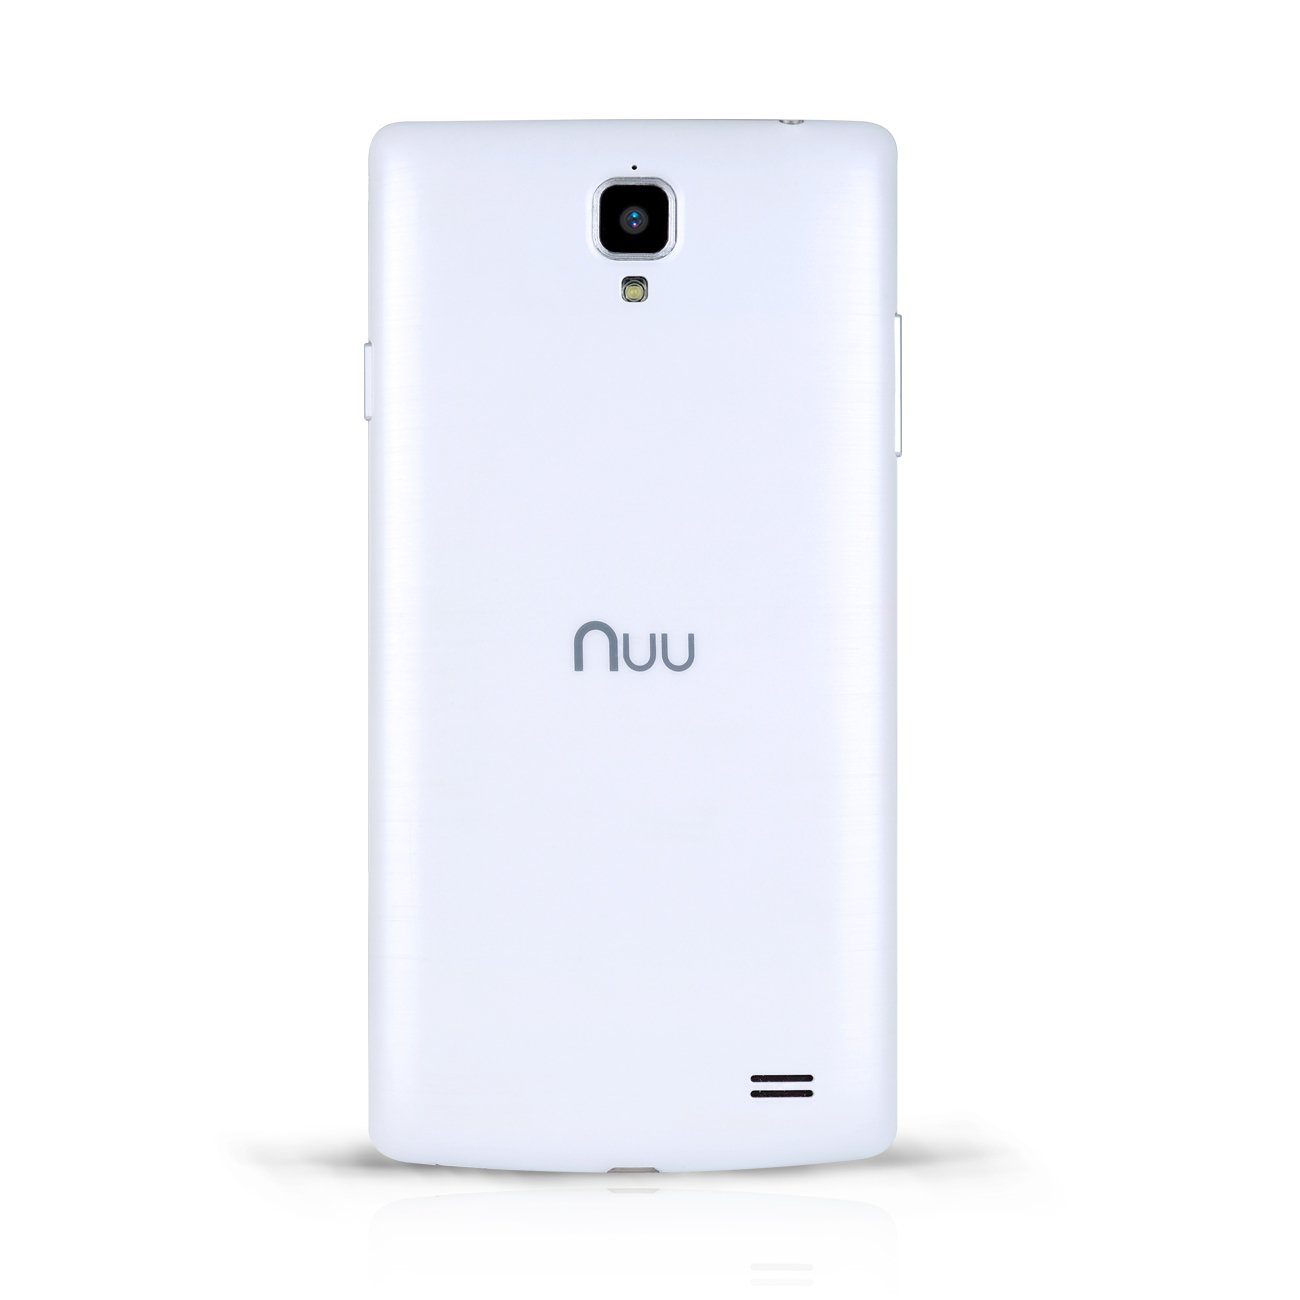 (WH) Nuu Z8 16GB - WHITE